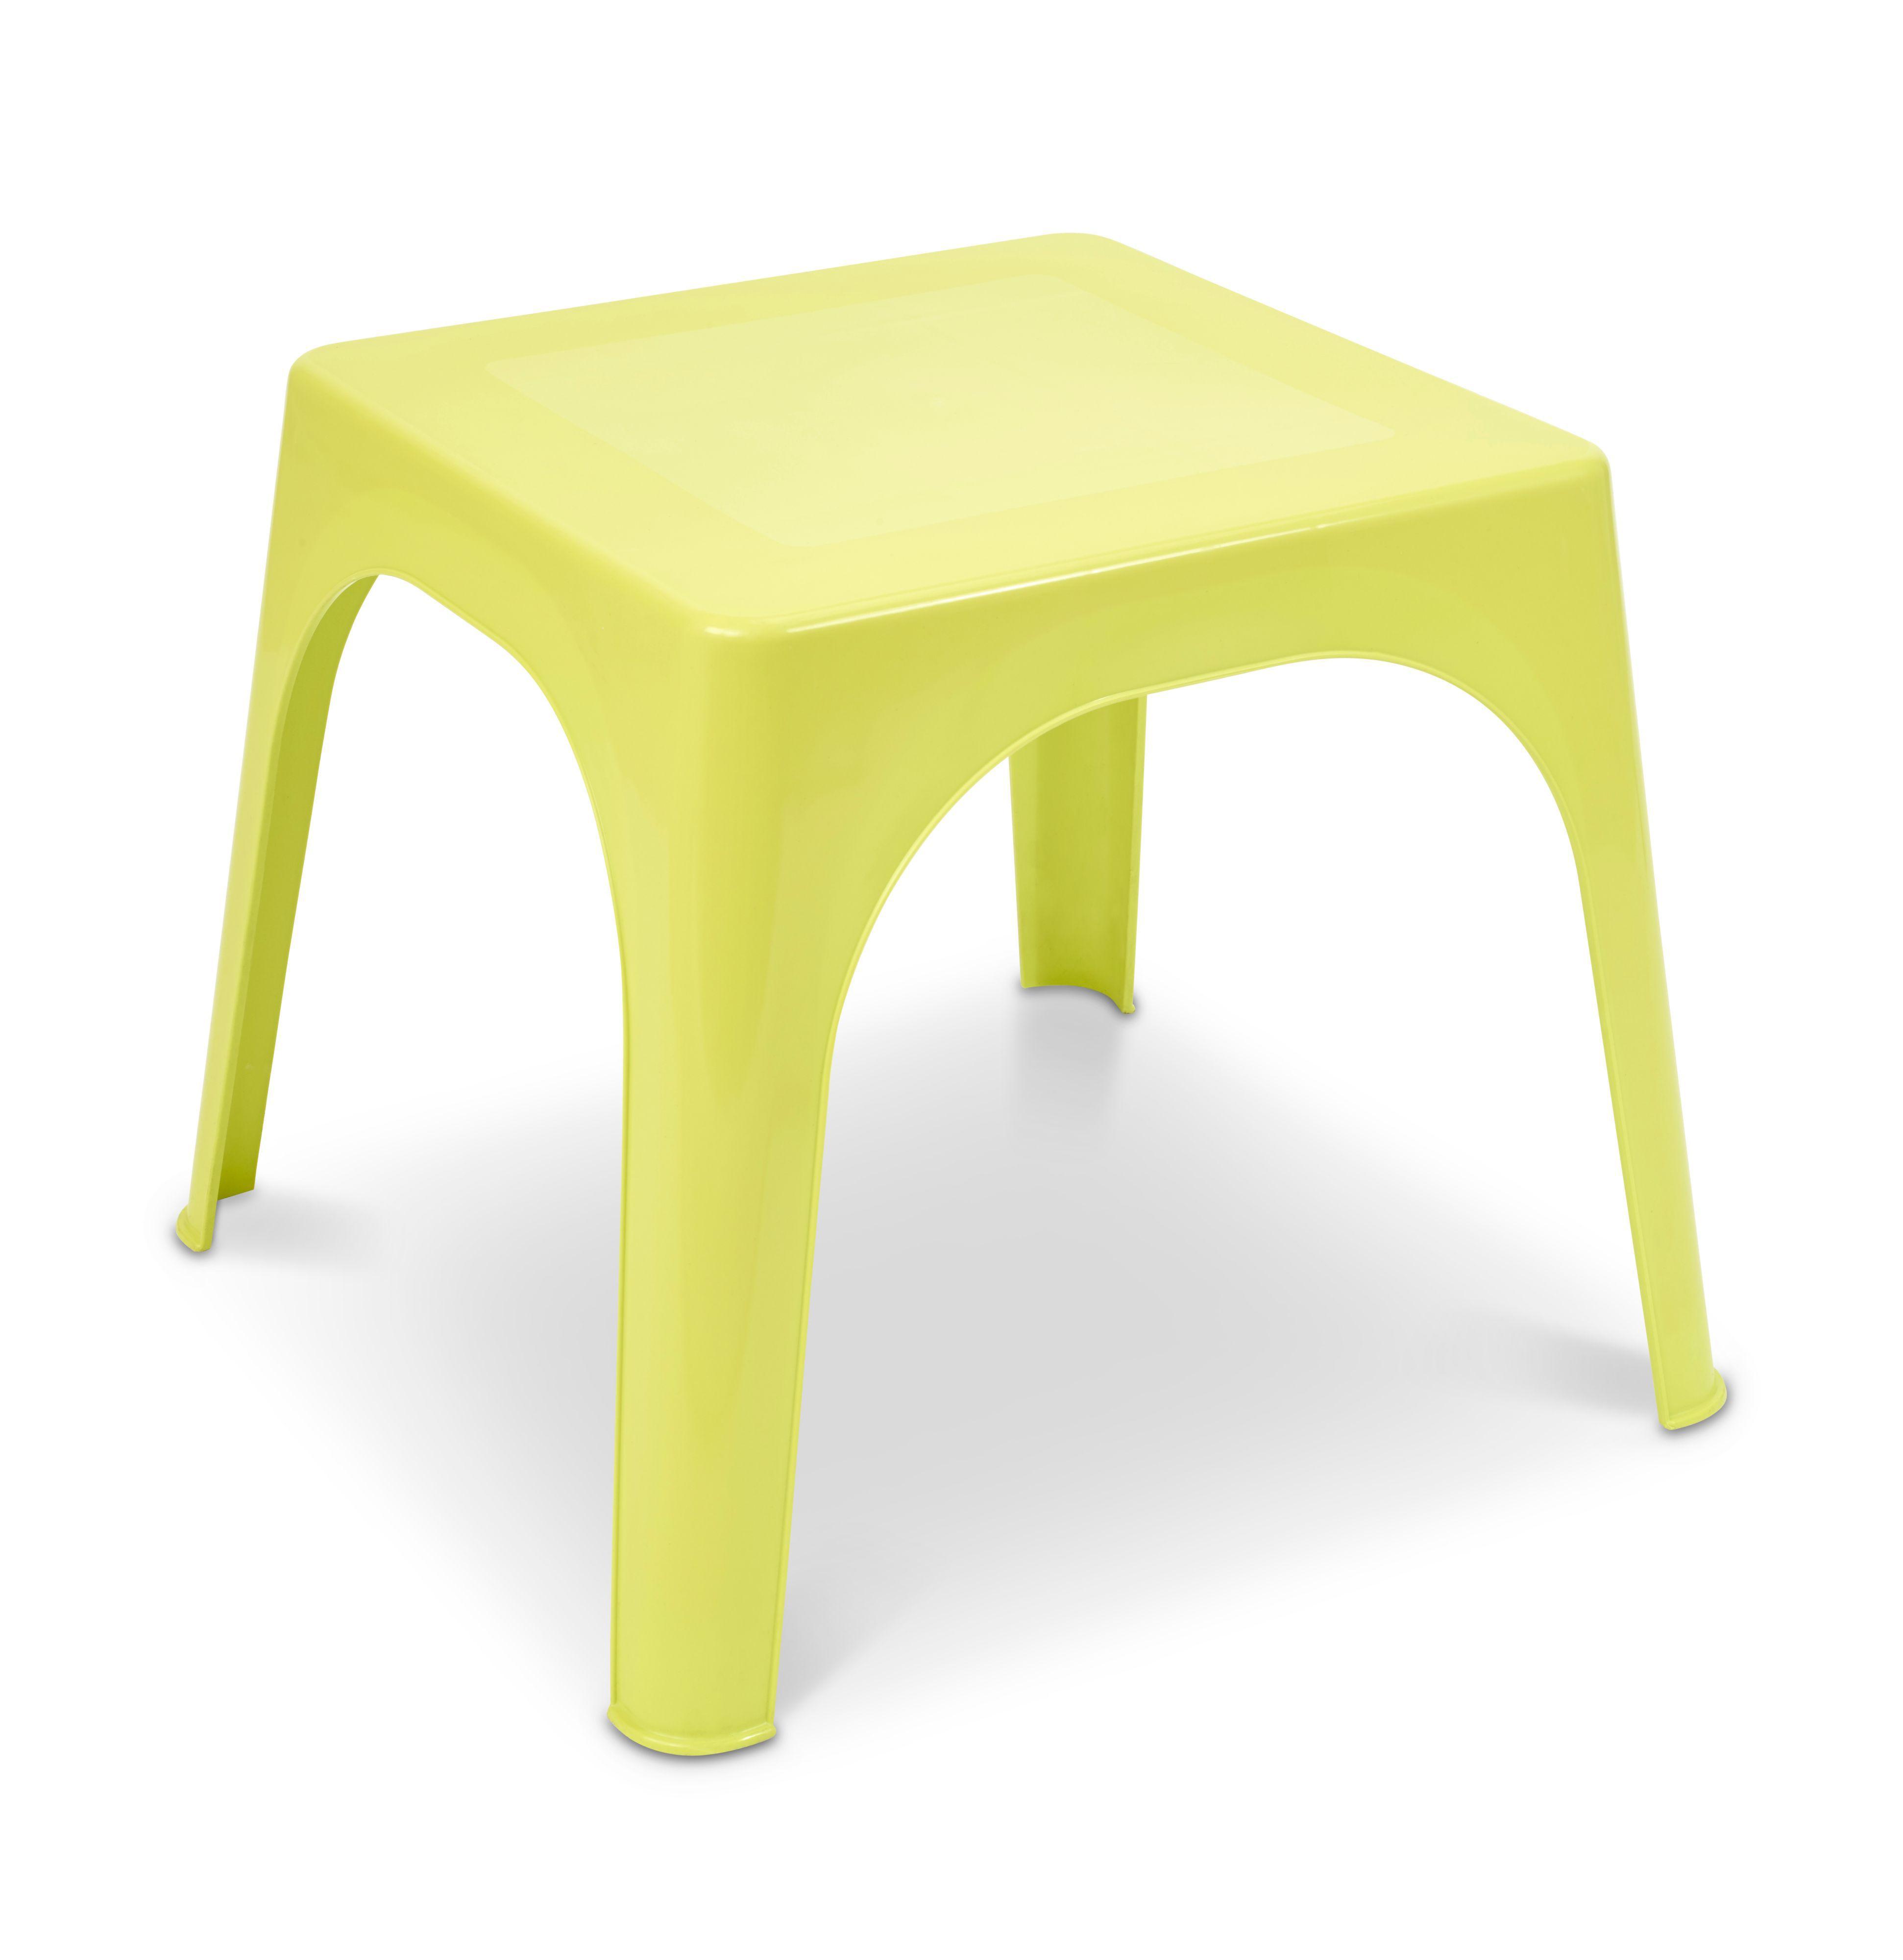 Noli Plastic 4 Seater Kids Table Departments Diy At B Amp Q